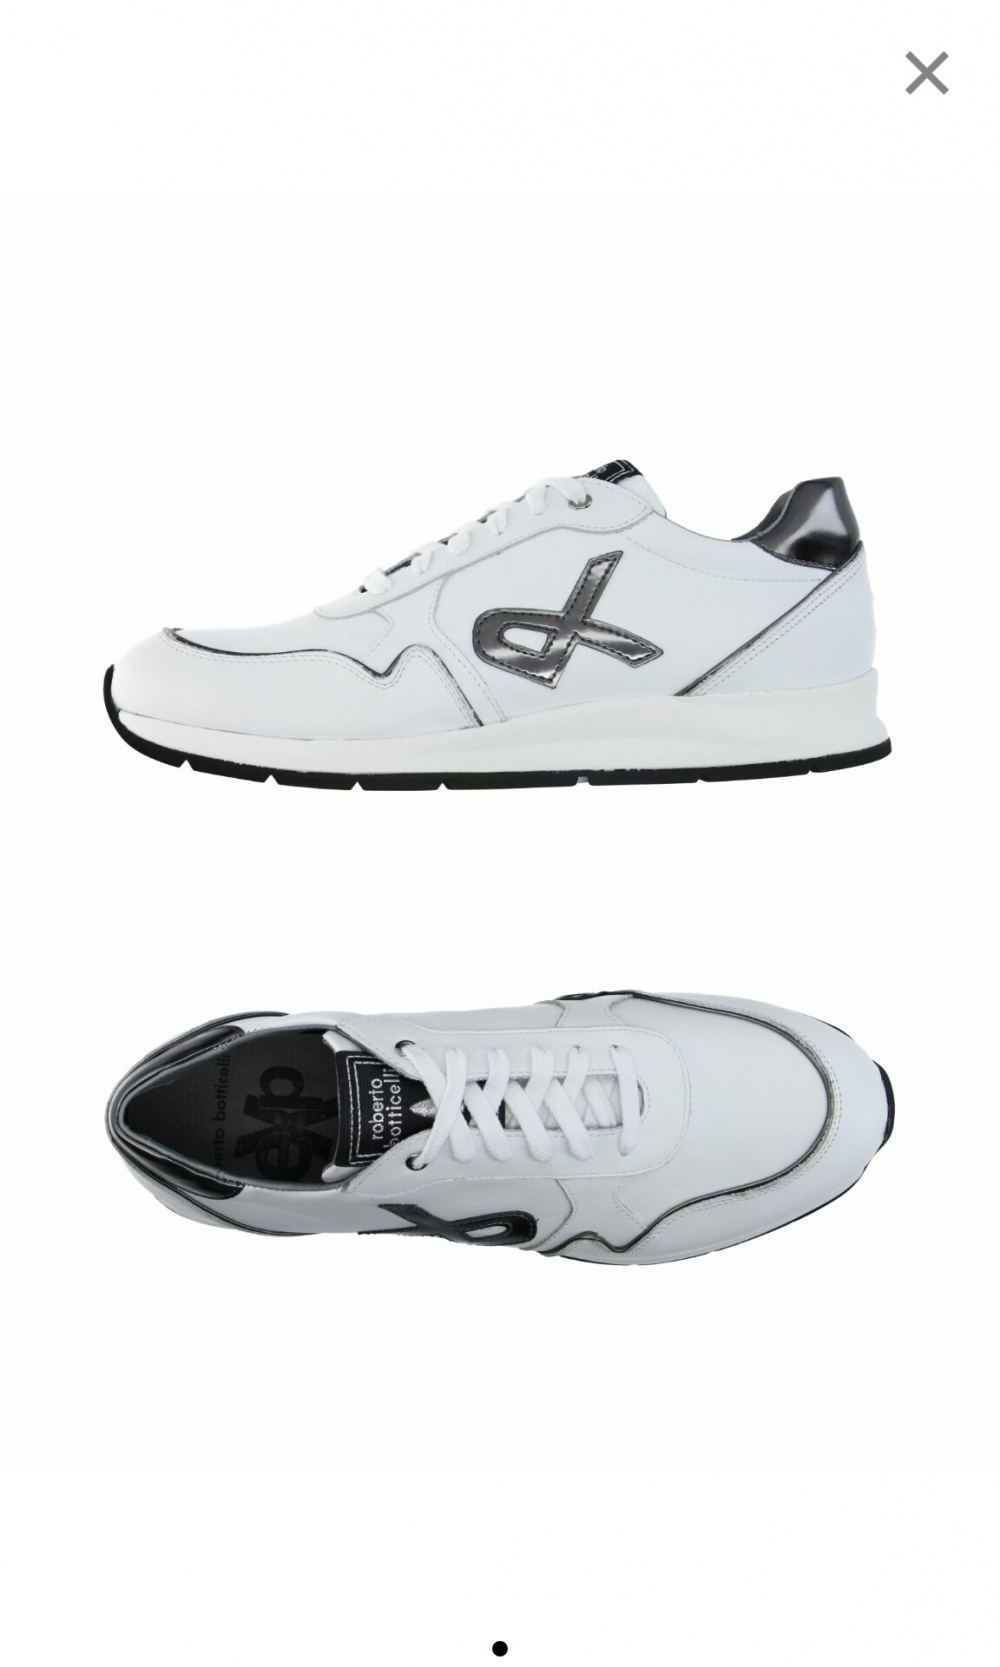 Мужские кроссовки BOTTICELLI LIMITED, 42 размер.